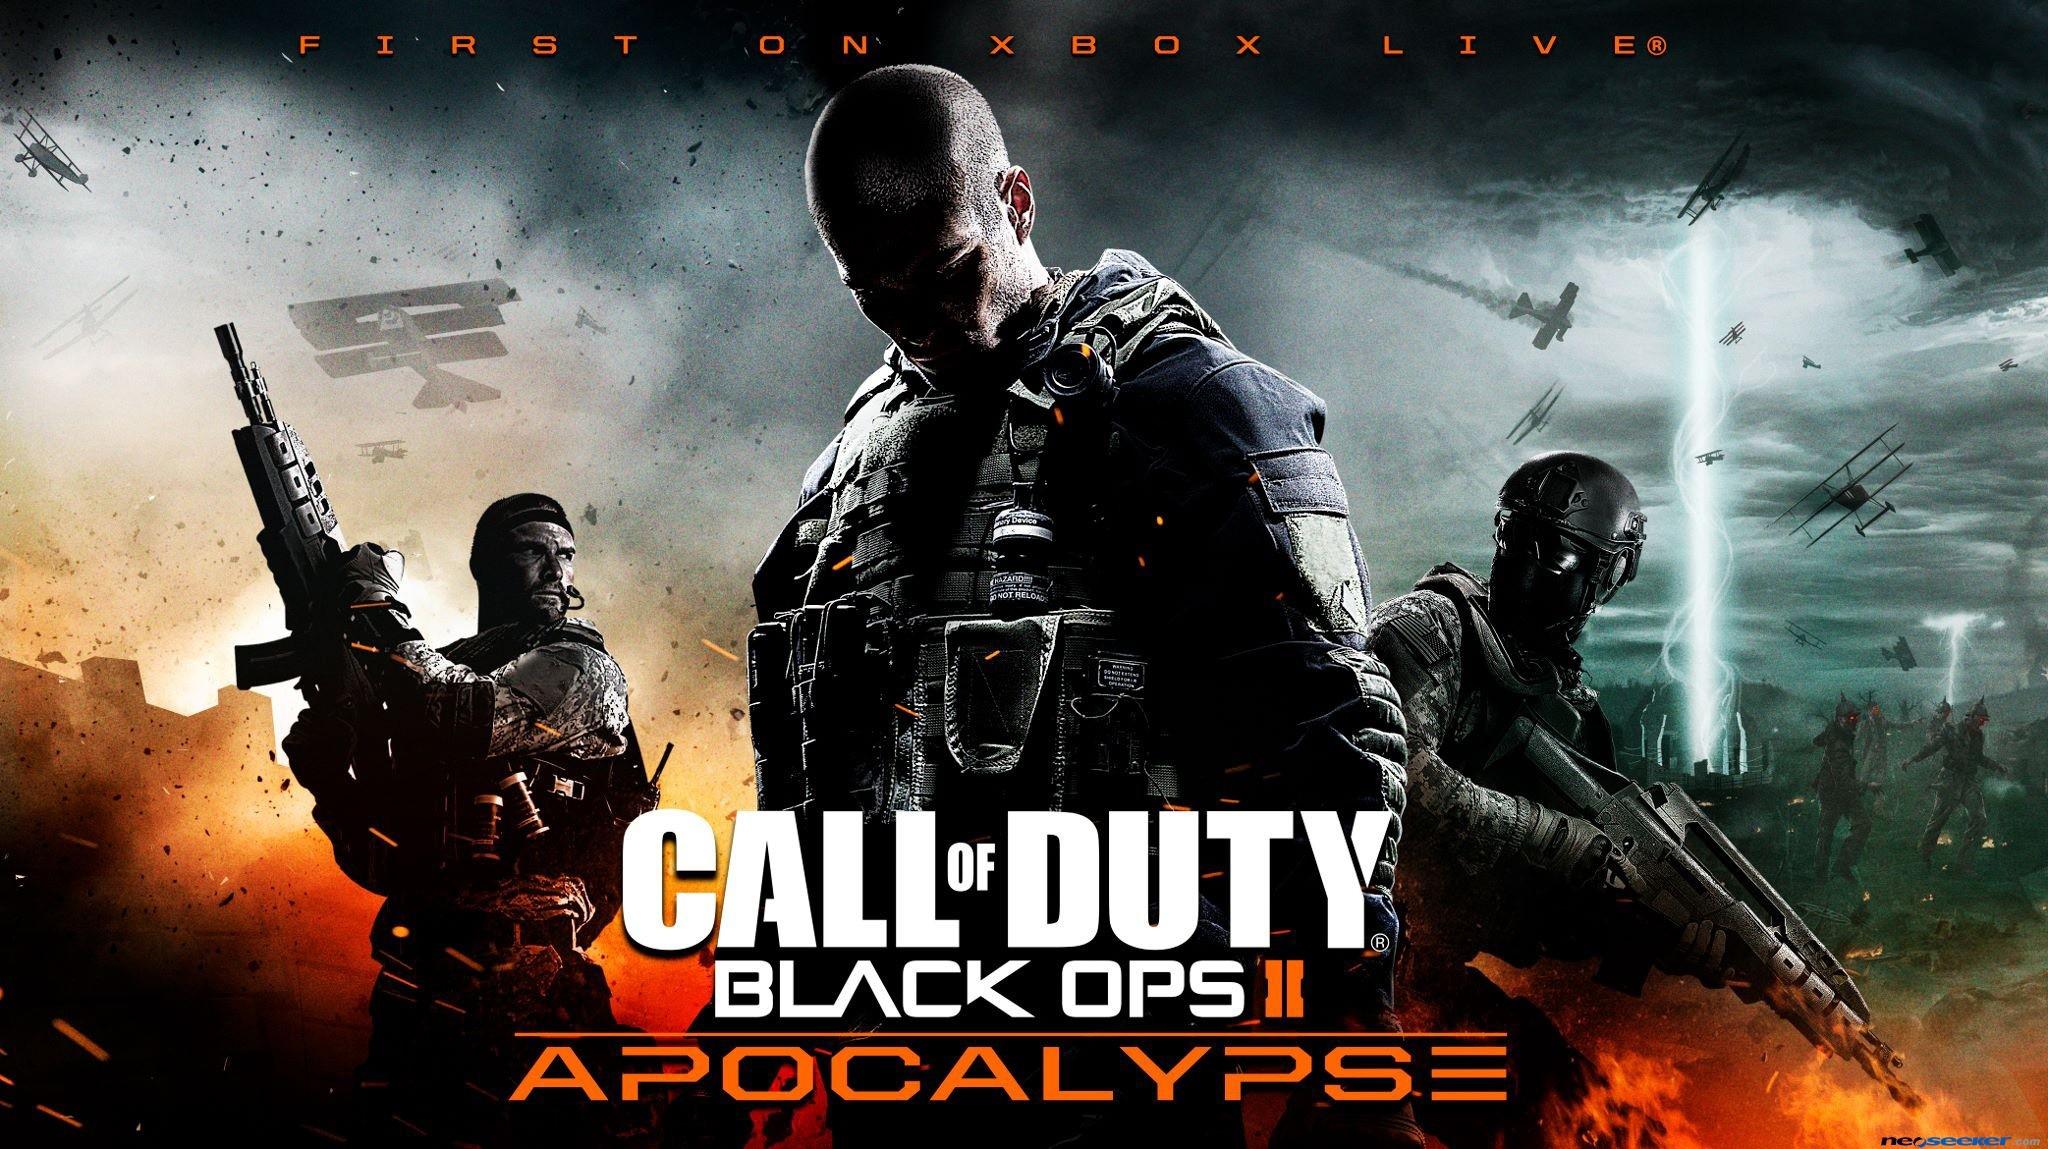 call of duty black ops 2 wallpaper hd